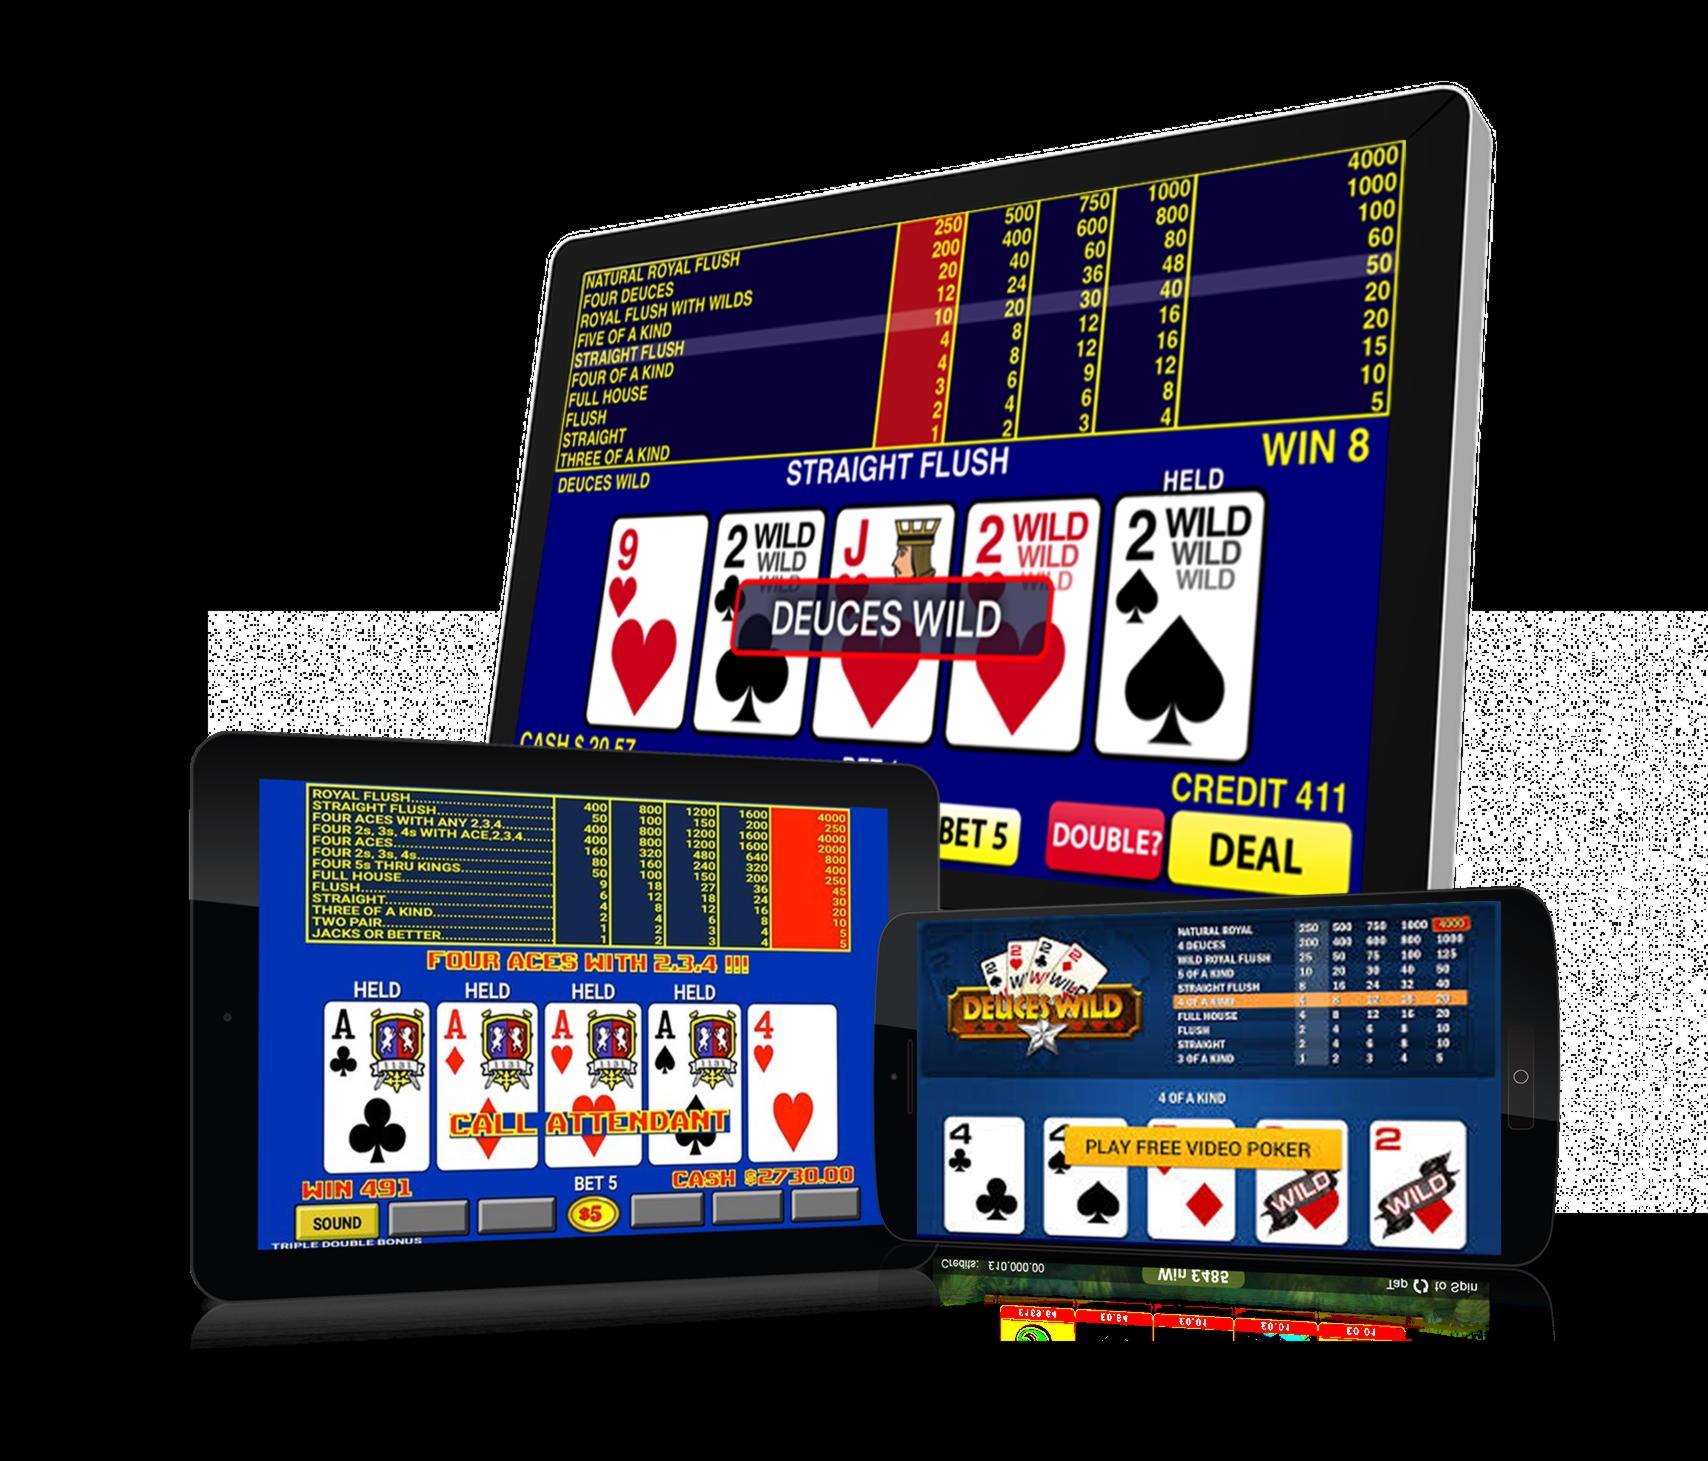 255 Free Spins no deposit casino at Spin Fiesta